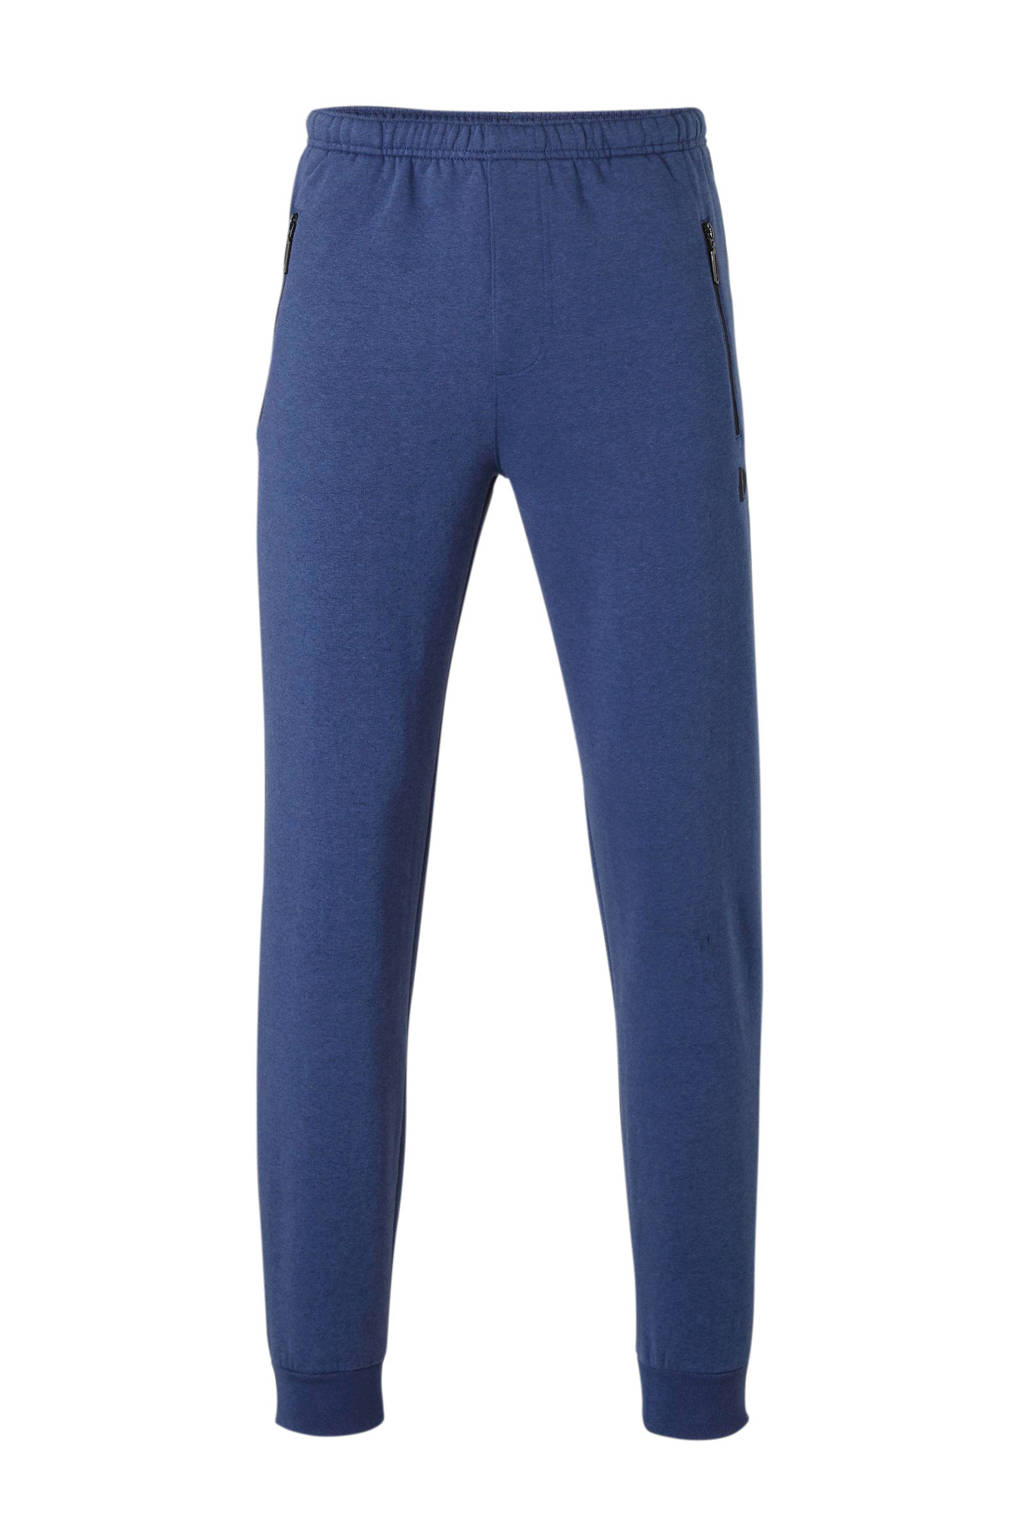 Donnay   trainingsbroek blauw gemeleerd, blauw melange